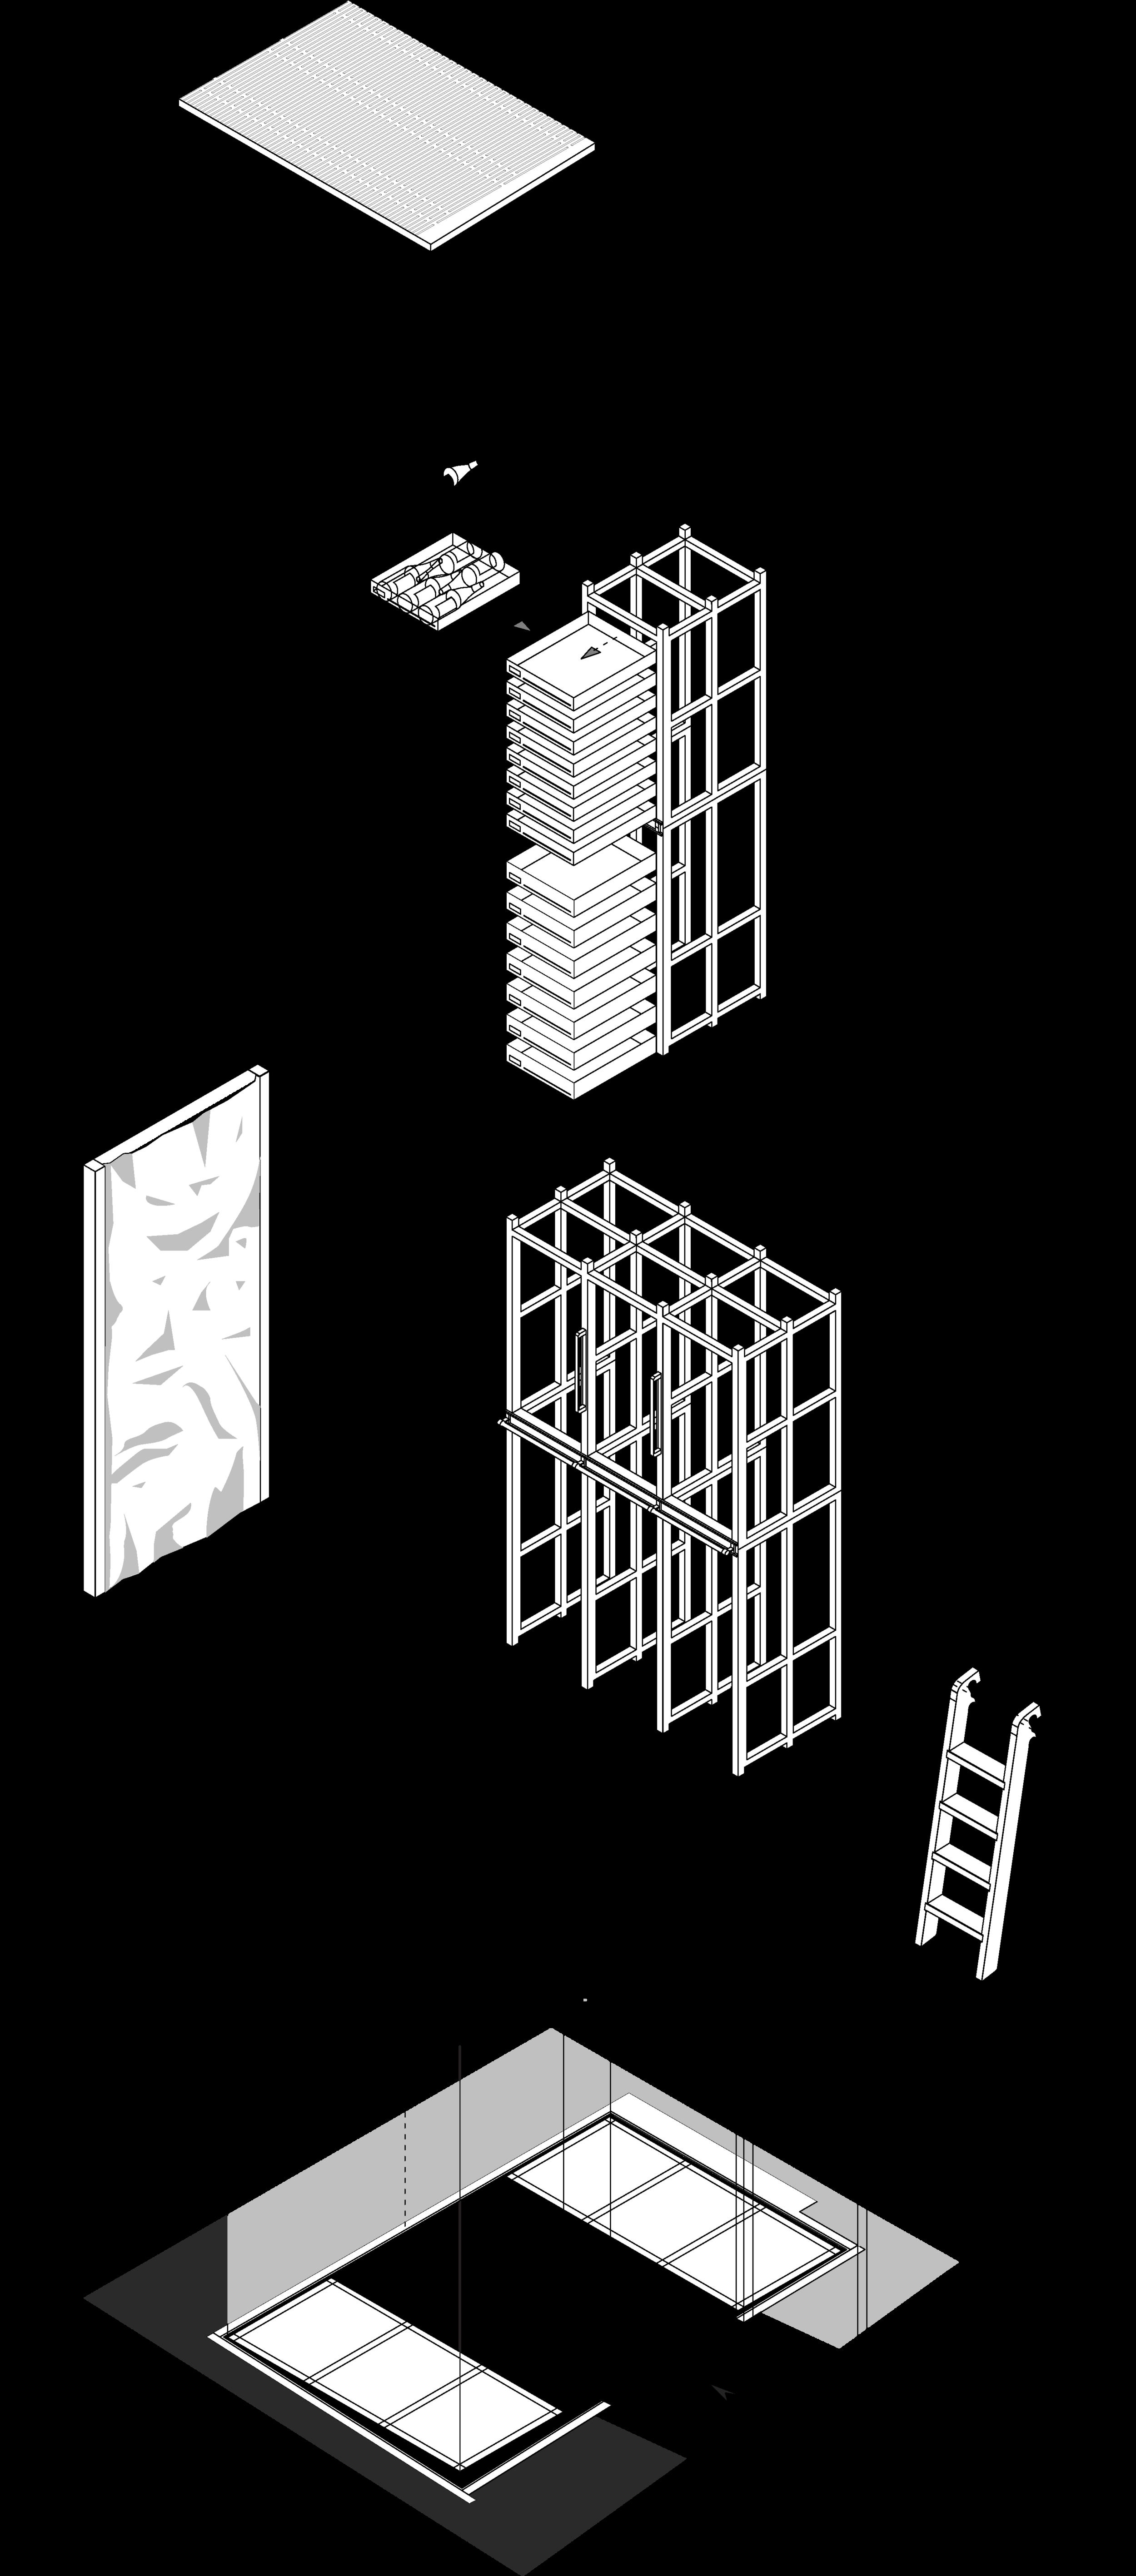 SENSIS_WINECELLAR_FRANKGEHRY_CUSTOMMADE_DESIGN